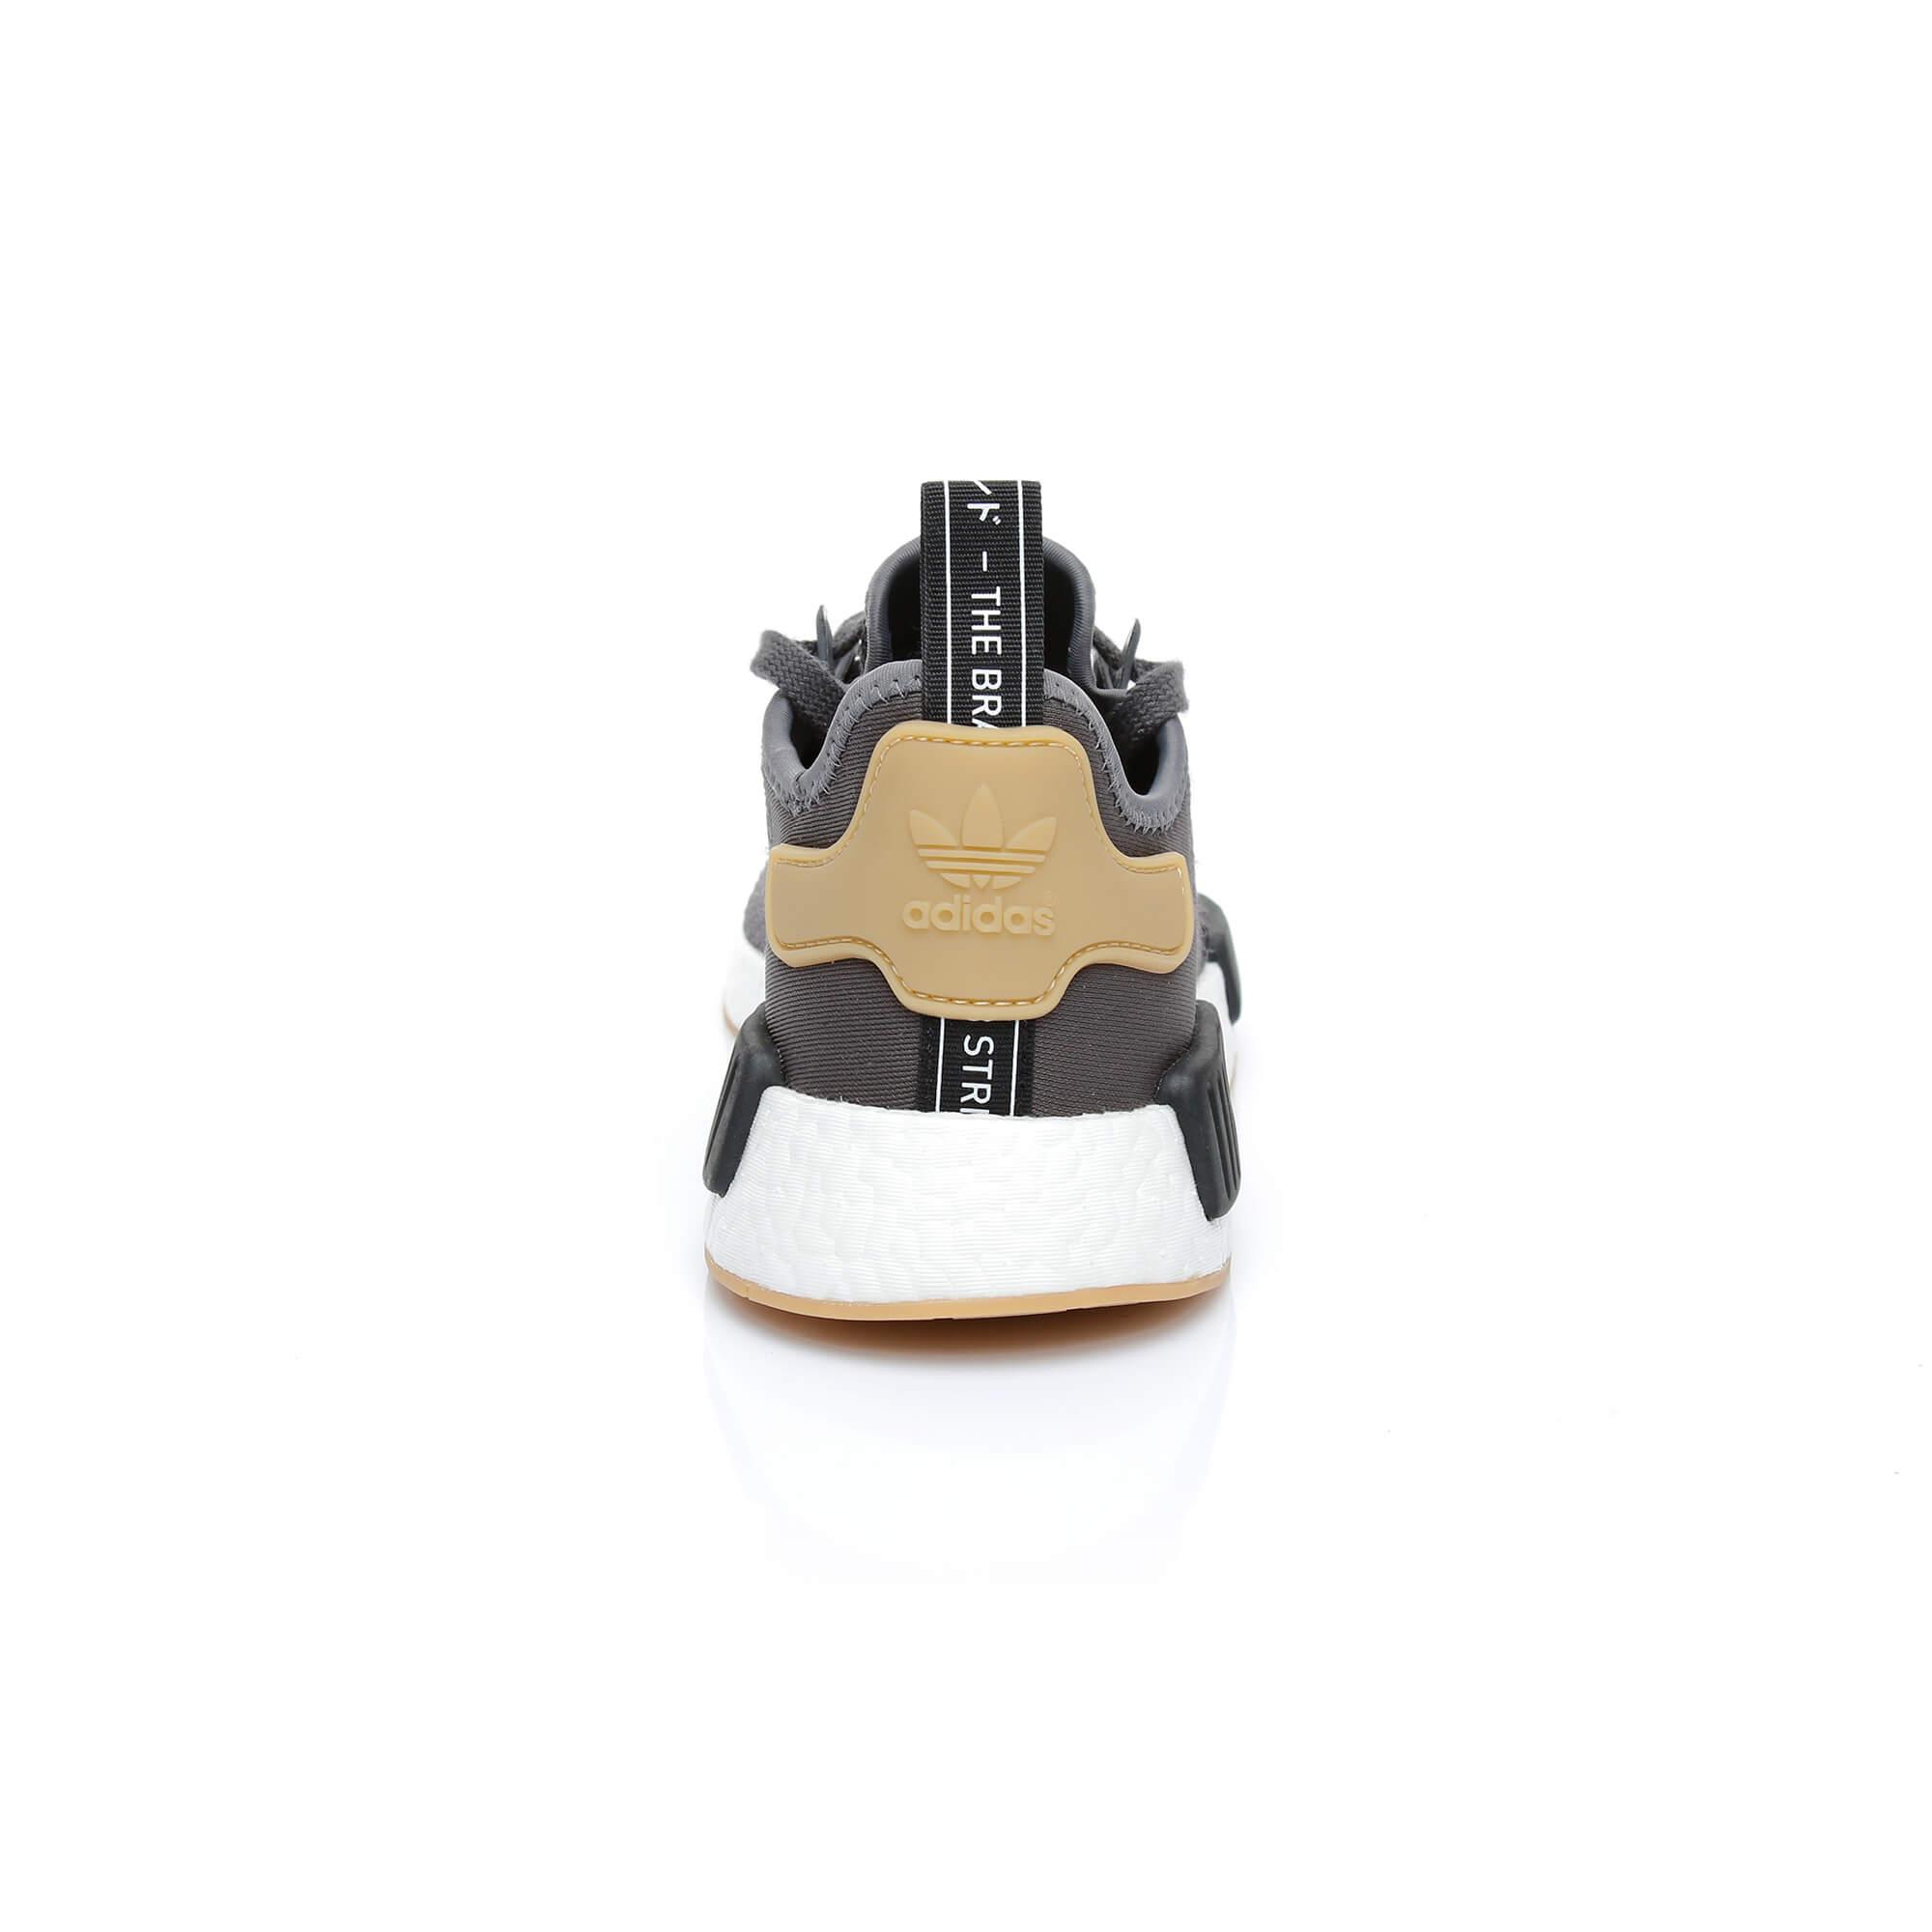 adidas NMD R1 Unisex Gri Spor Ayakkabı